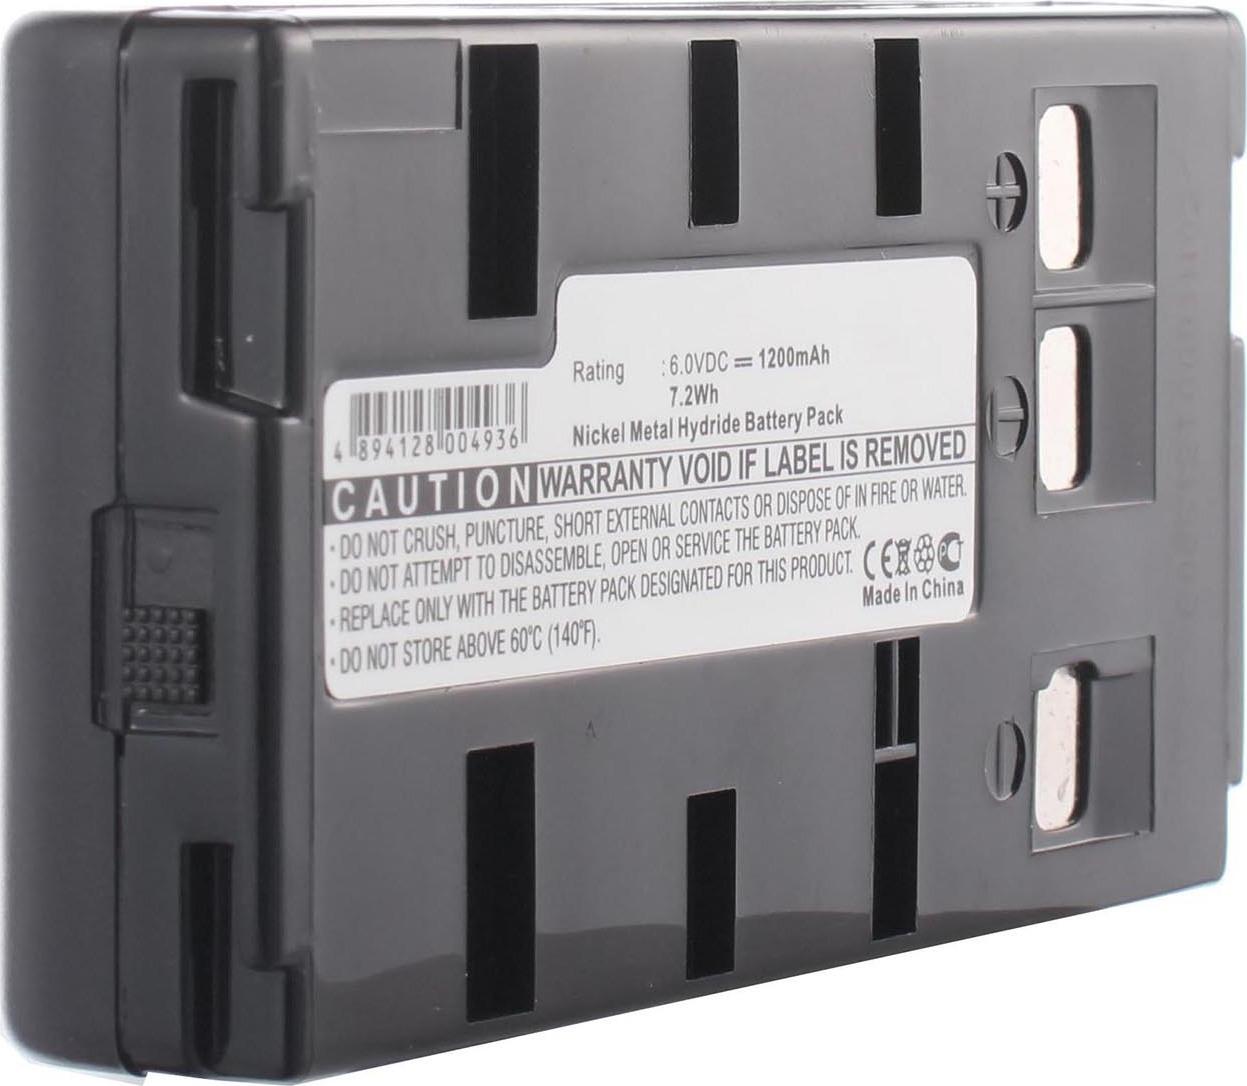 Аккумуляторная батарея iBatt iB-T3-F357 1200mAh для камер Panasonic NV-G120, NV-S250, NV-S800, NV-G101, NV-G220, NV-S600,  для Samsung VP-E405, VP-U12, VP-A30, VP-H65, VP-E807, VP-H66, VP-J52, VP-U10, VP-A50, VP-A55, VP-K75, VP-E808, VP-K85, VP-H68,